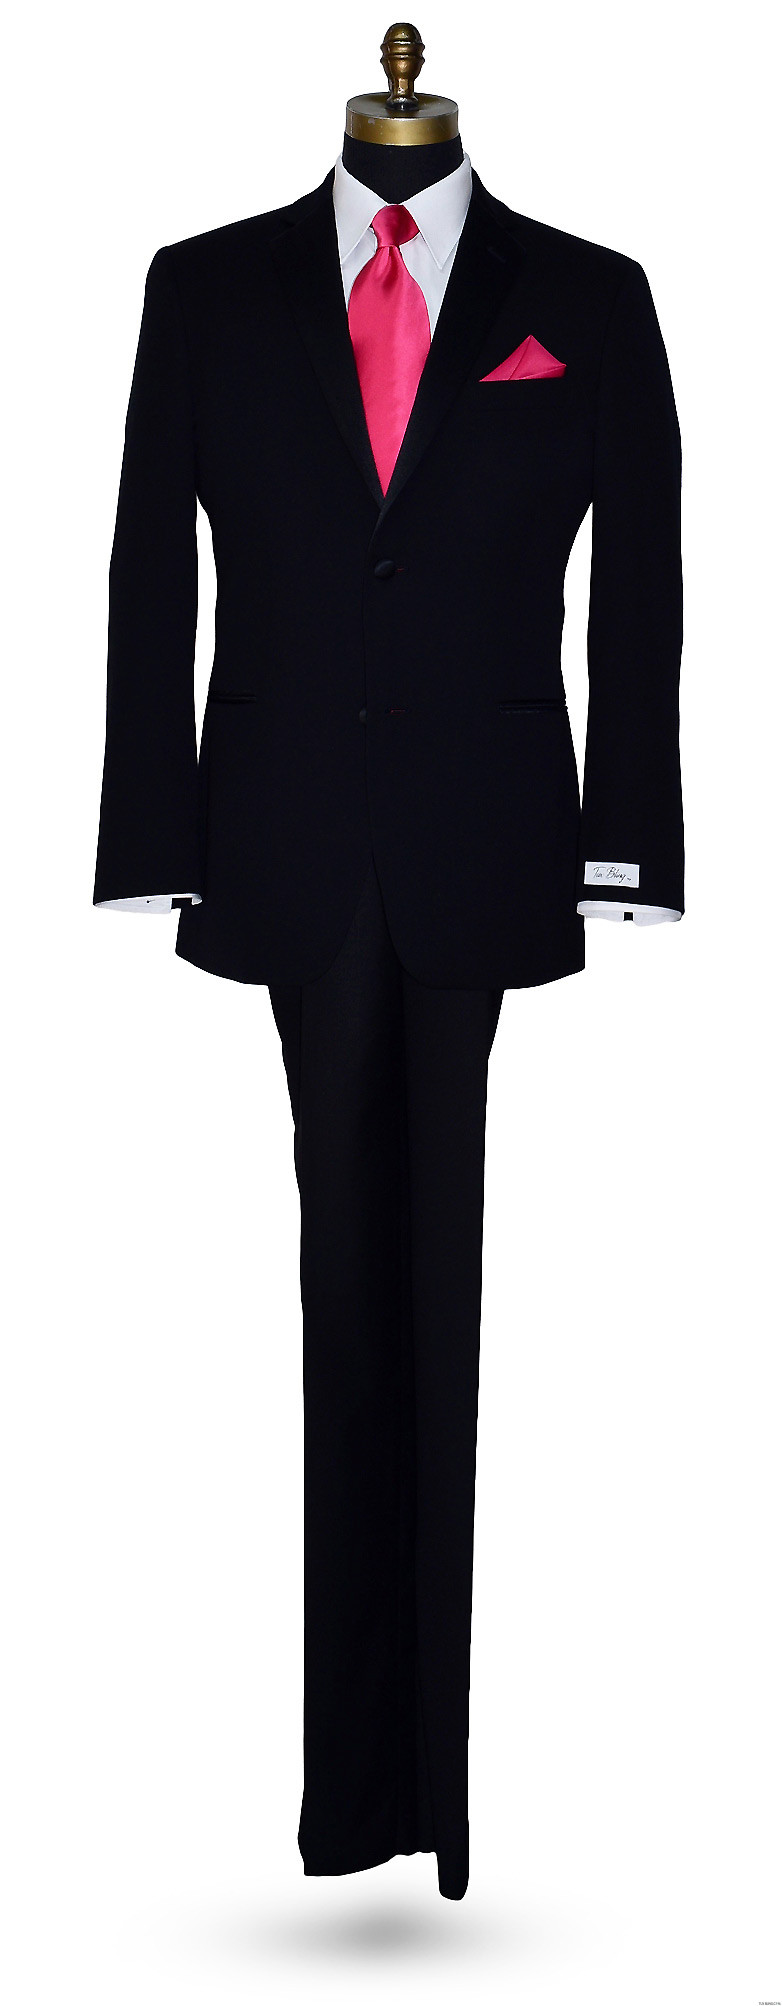 black wedding tuxedo by Tuxbling.com with hot pink silk long dress tie